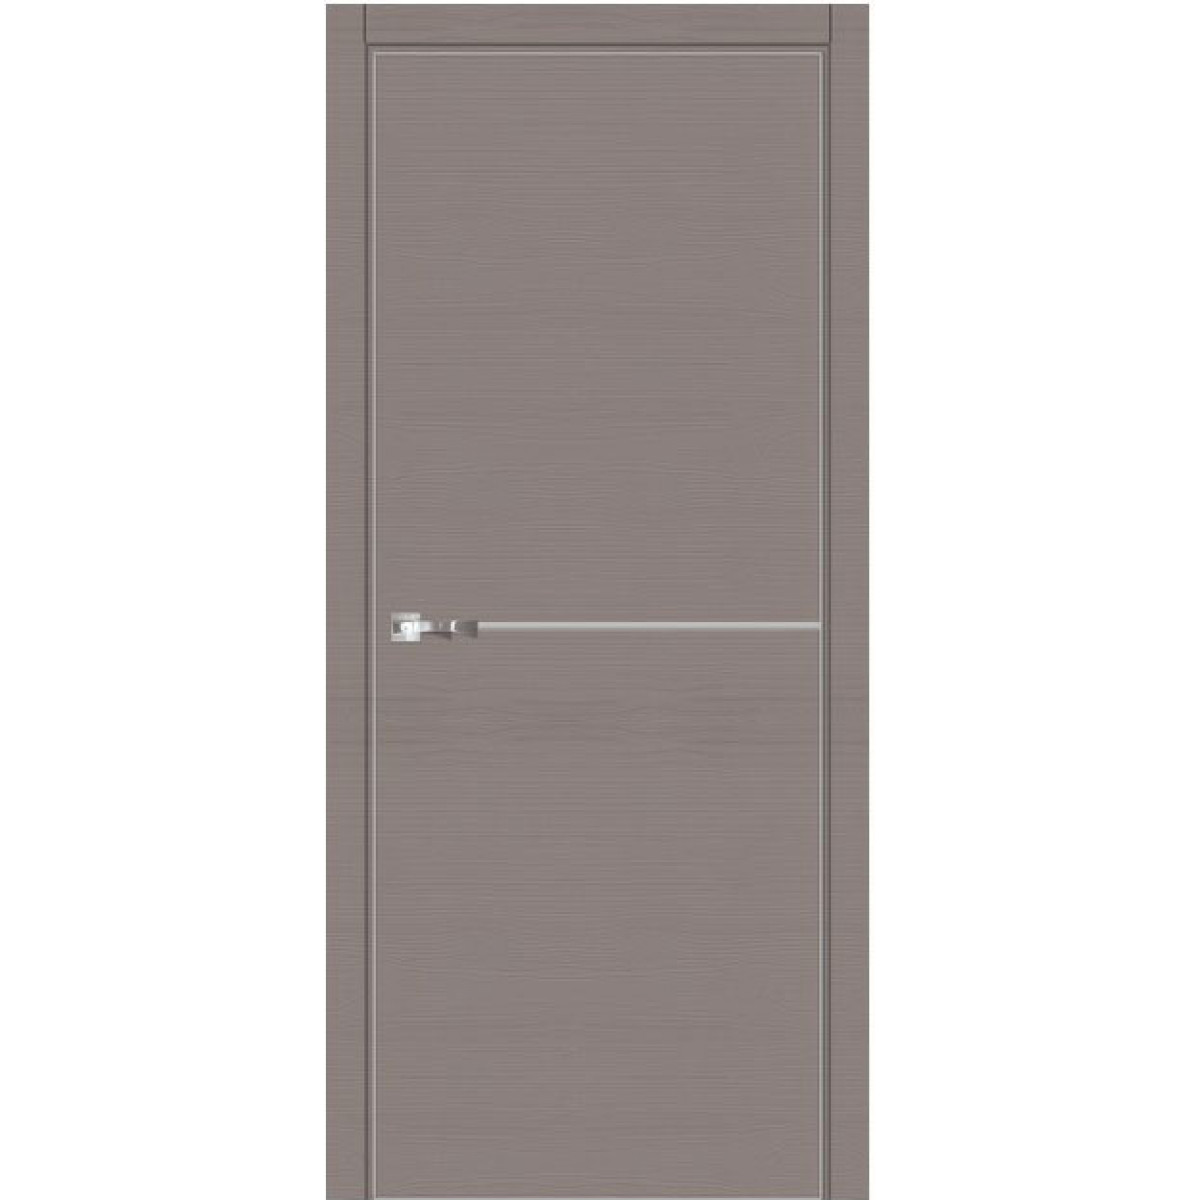 Межкомнатная дверь CL-04 Феникс